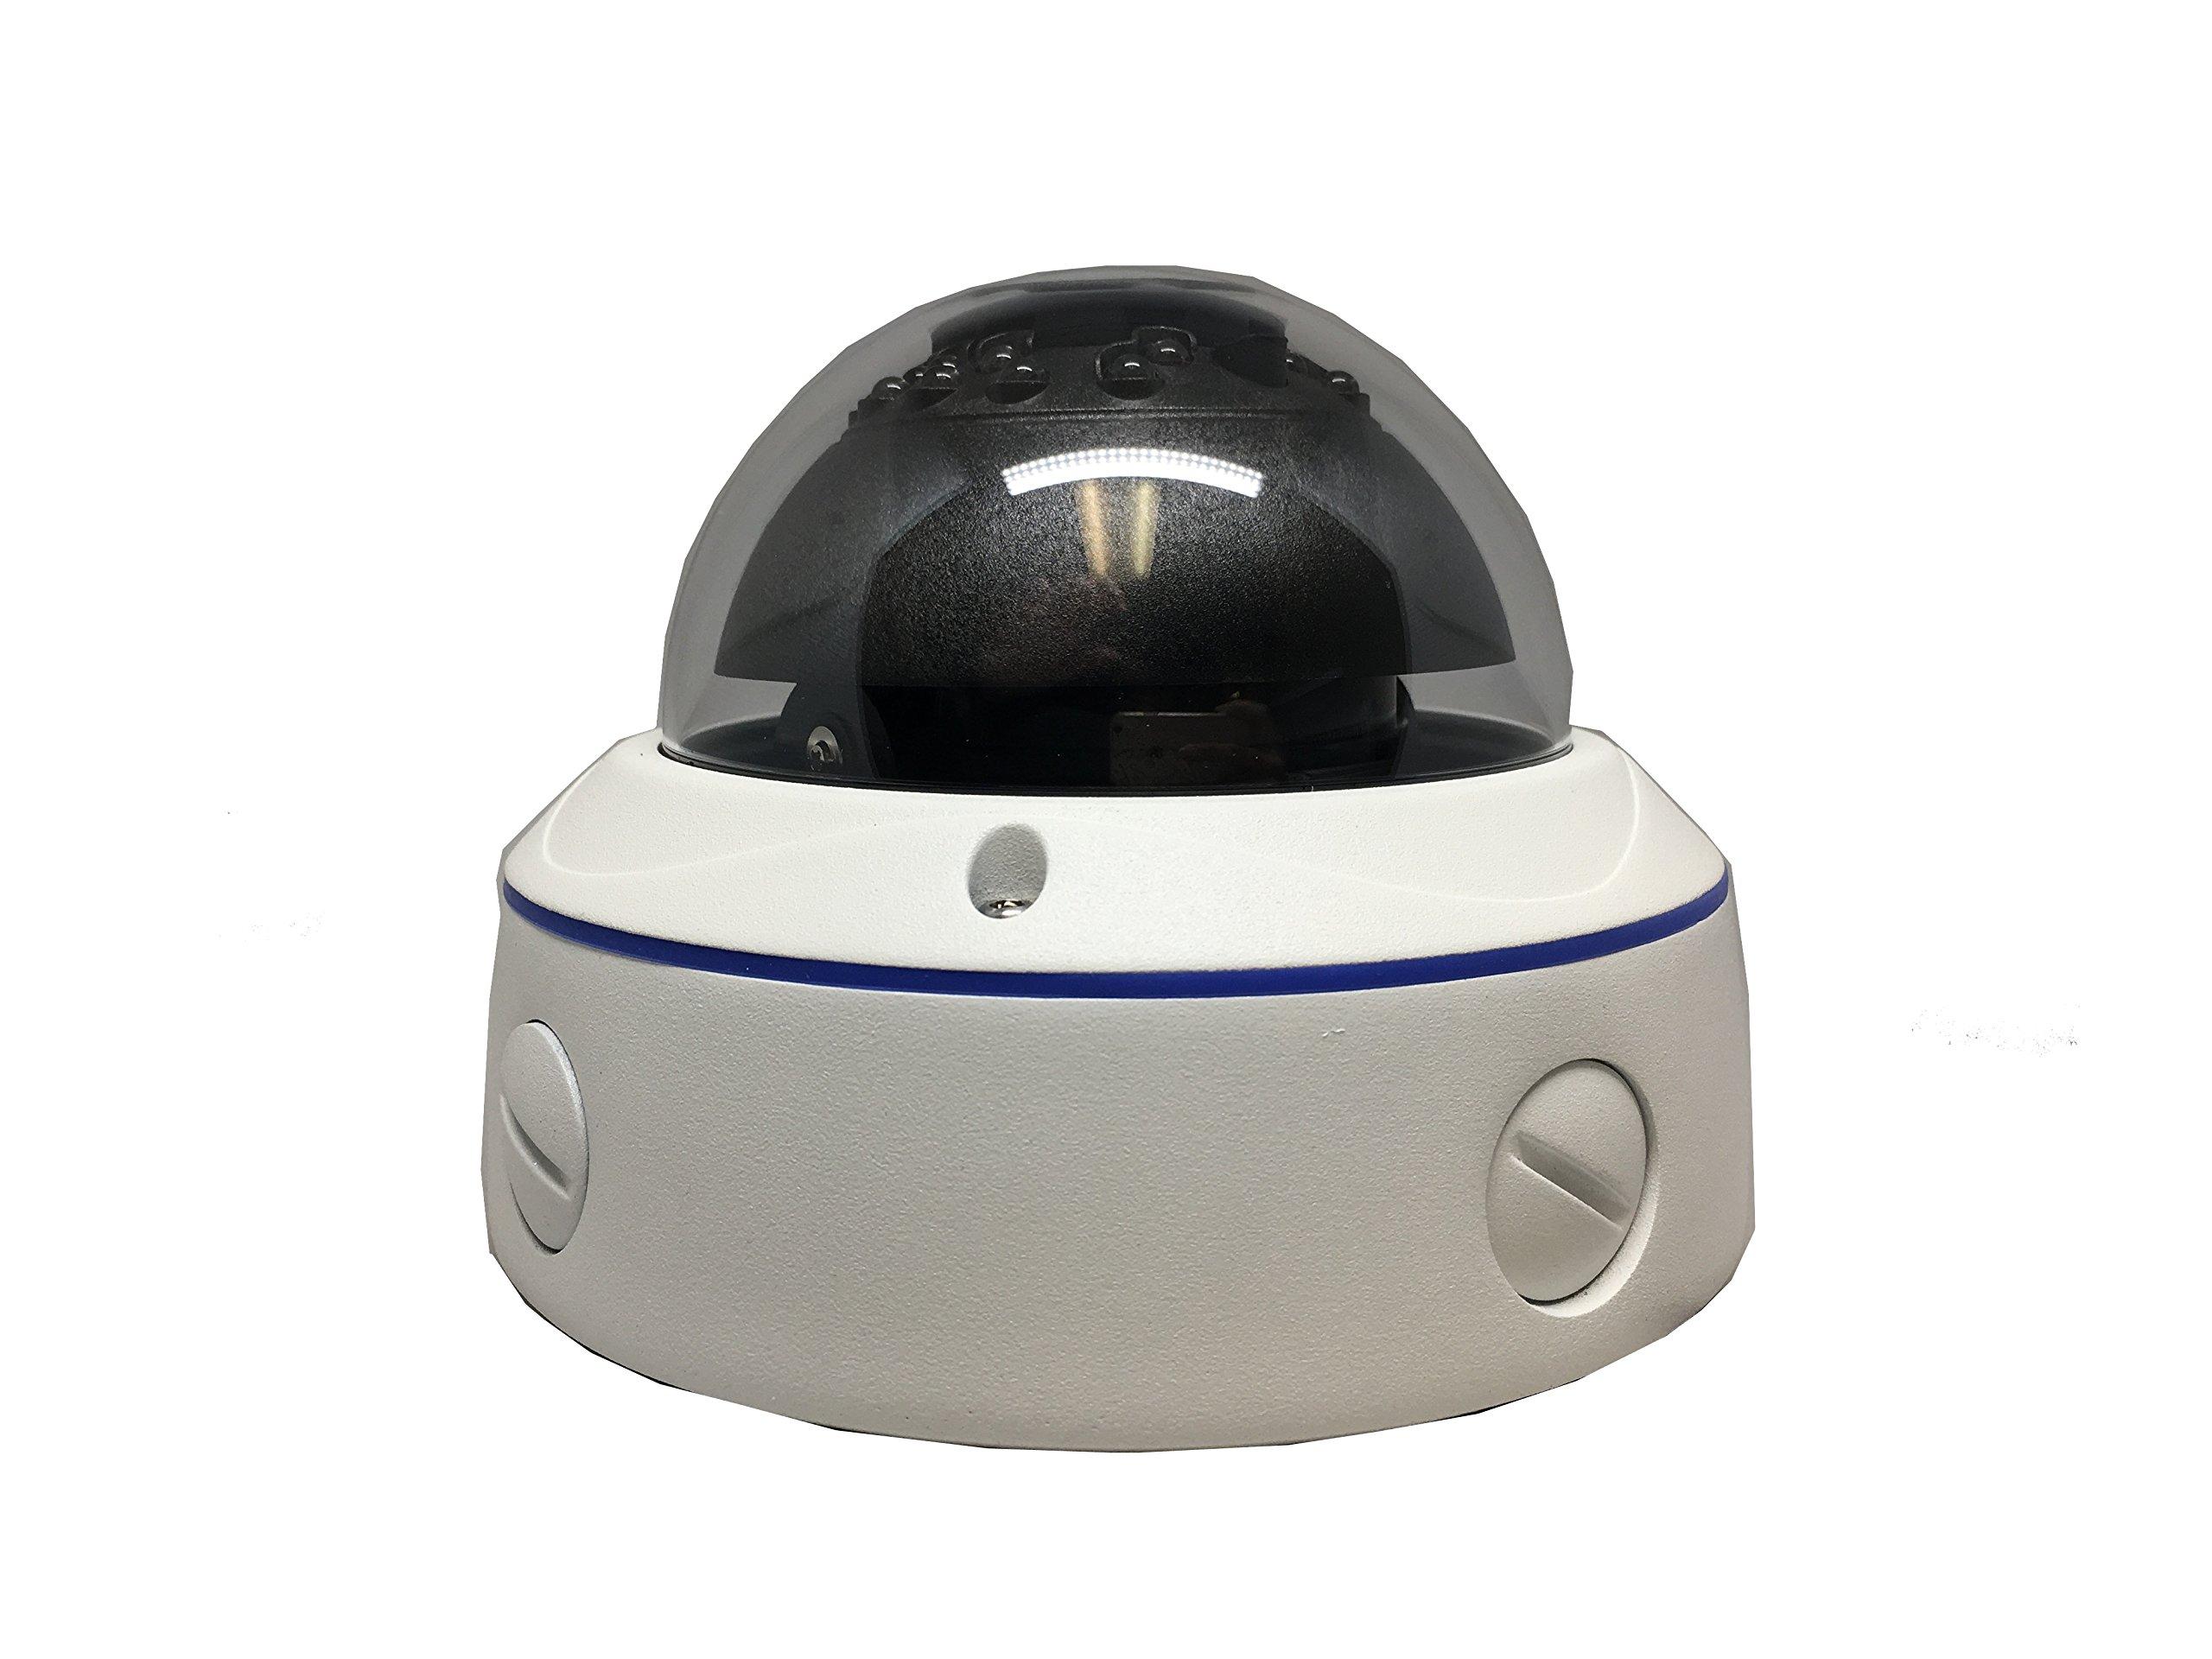 101AV 1080P True Full-HD 4in1 (TVI, AHD, CVI, CVBS) 2.8-12mm Varifocal Lens IR in/Outdoor Dome Camera Sony 2.1 Megapixel 1920x1080 Image Sensor 18 pcs Smart IR 100ft IR Range DWDR UTC OSD IP66